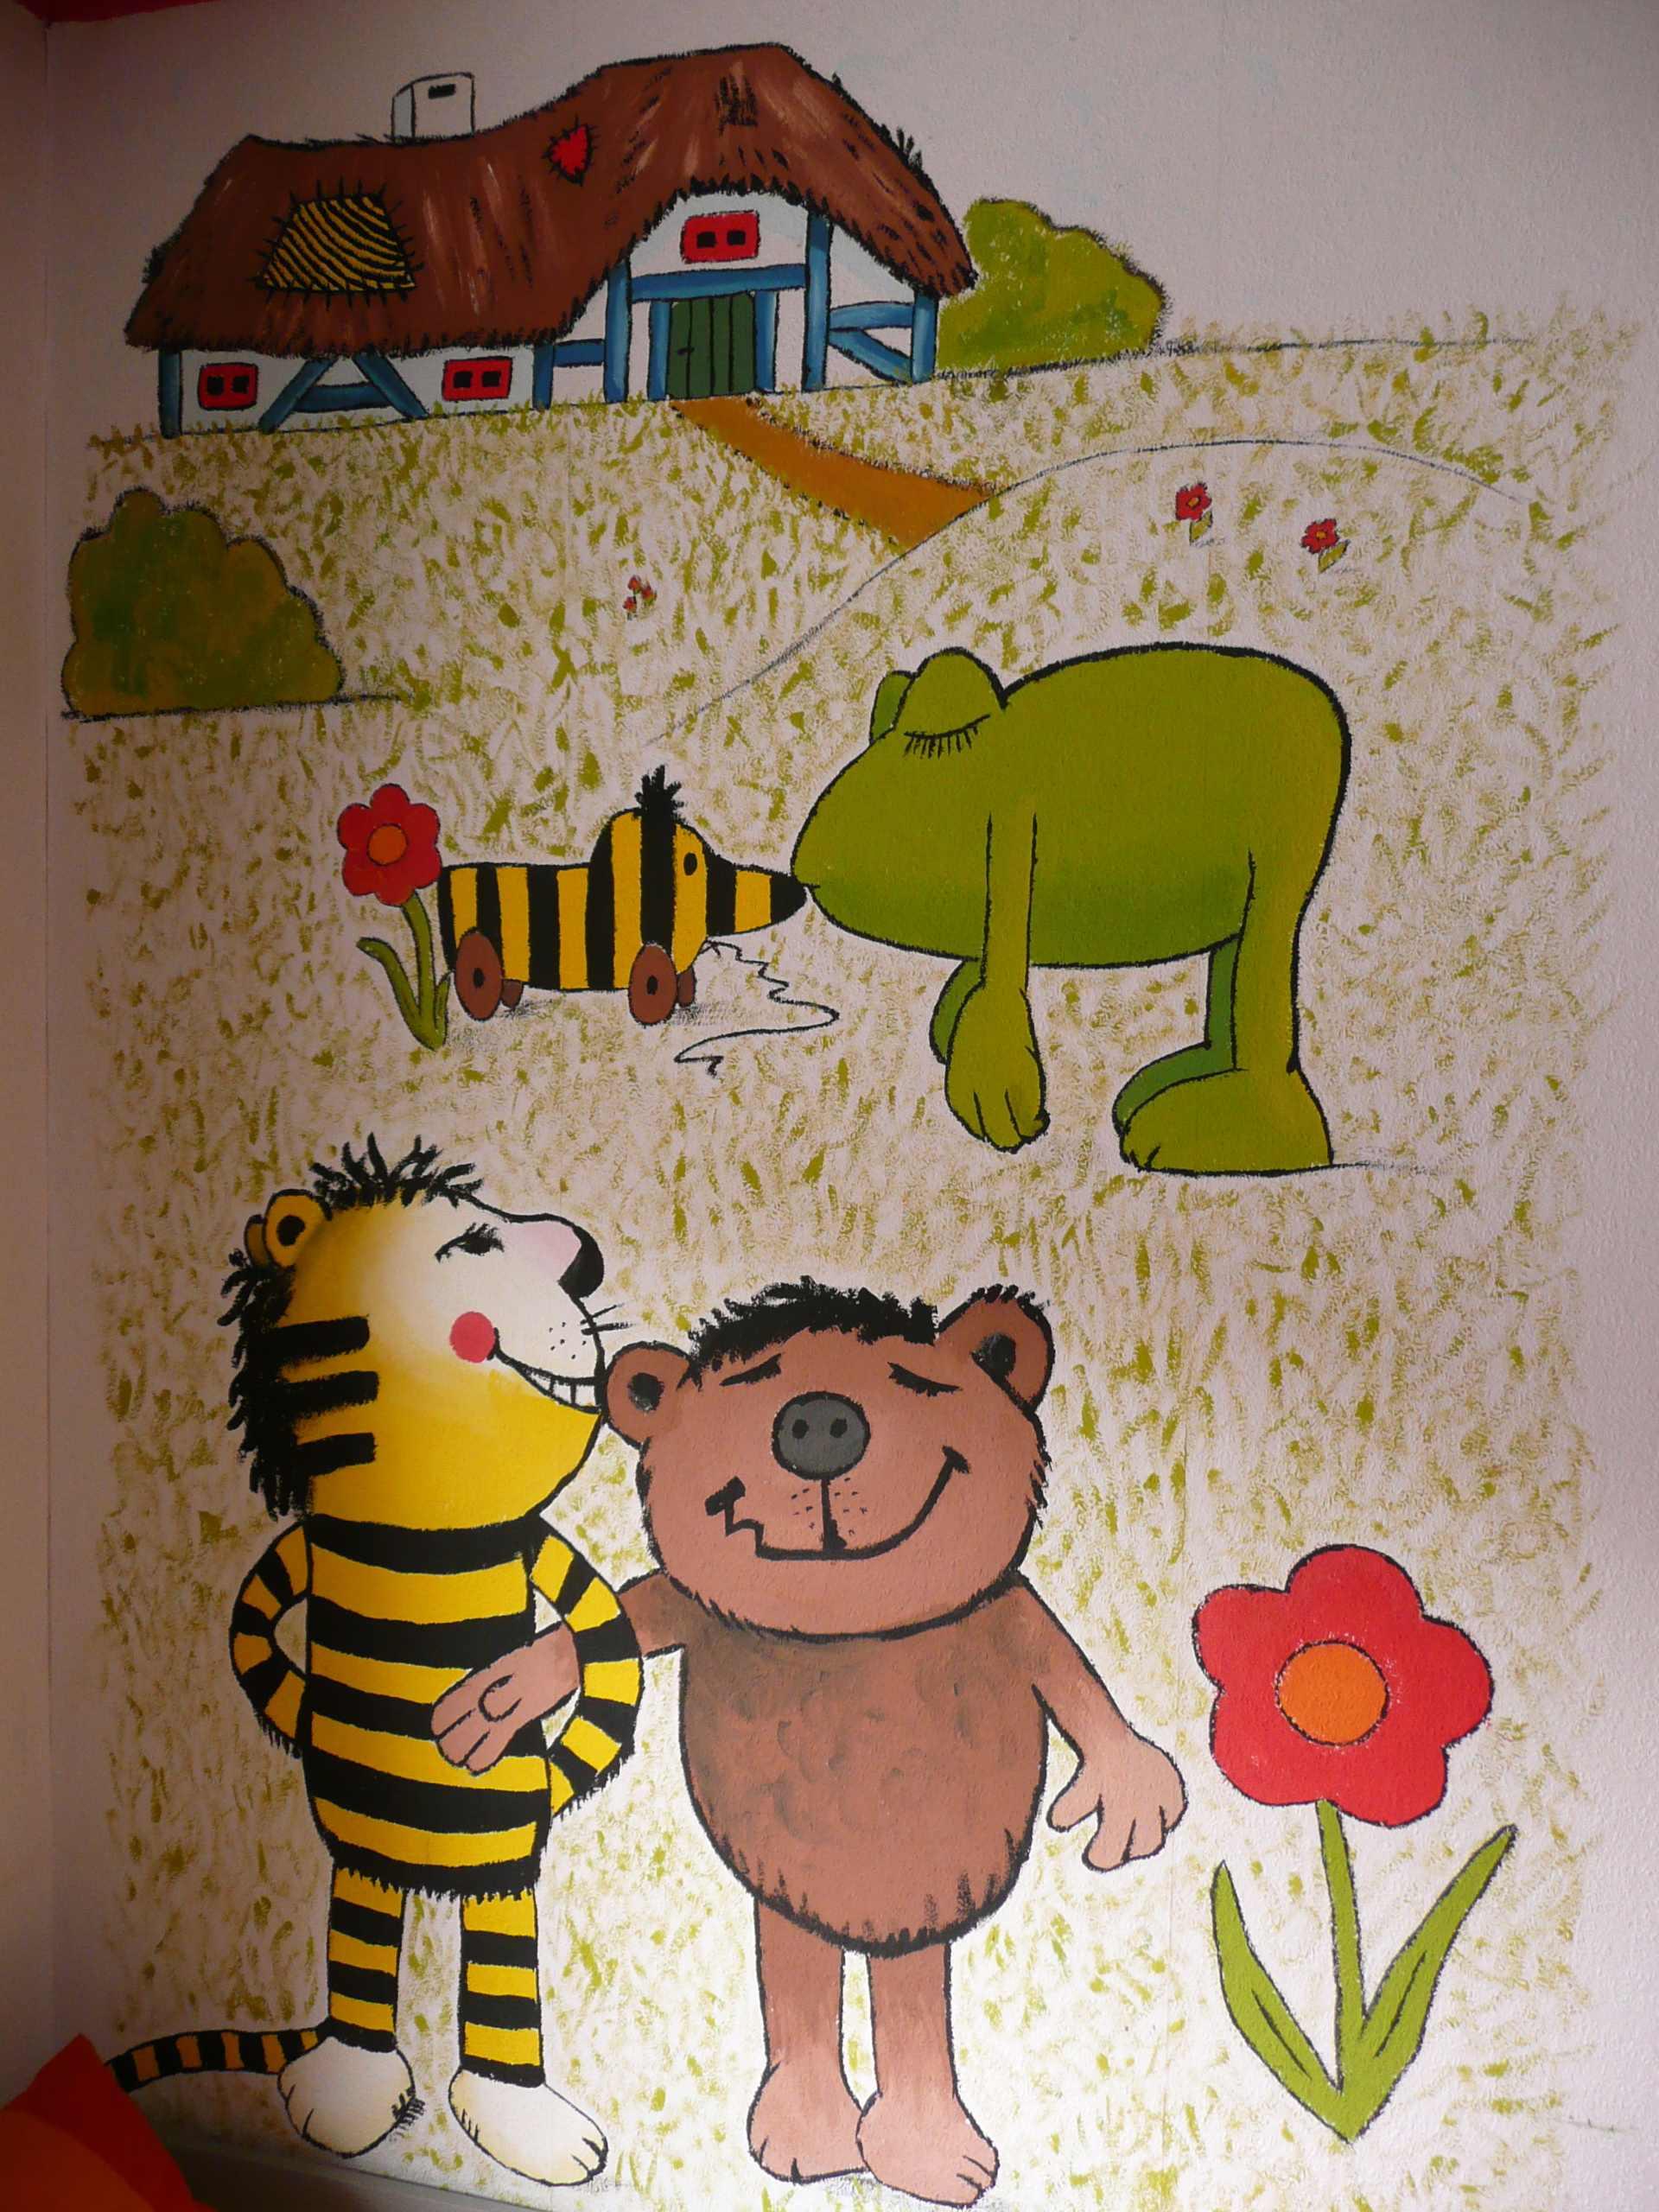 Kinderzimmer | blog.simons.ac